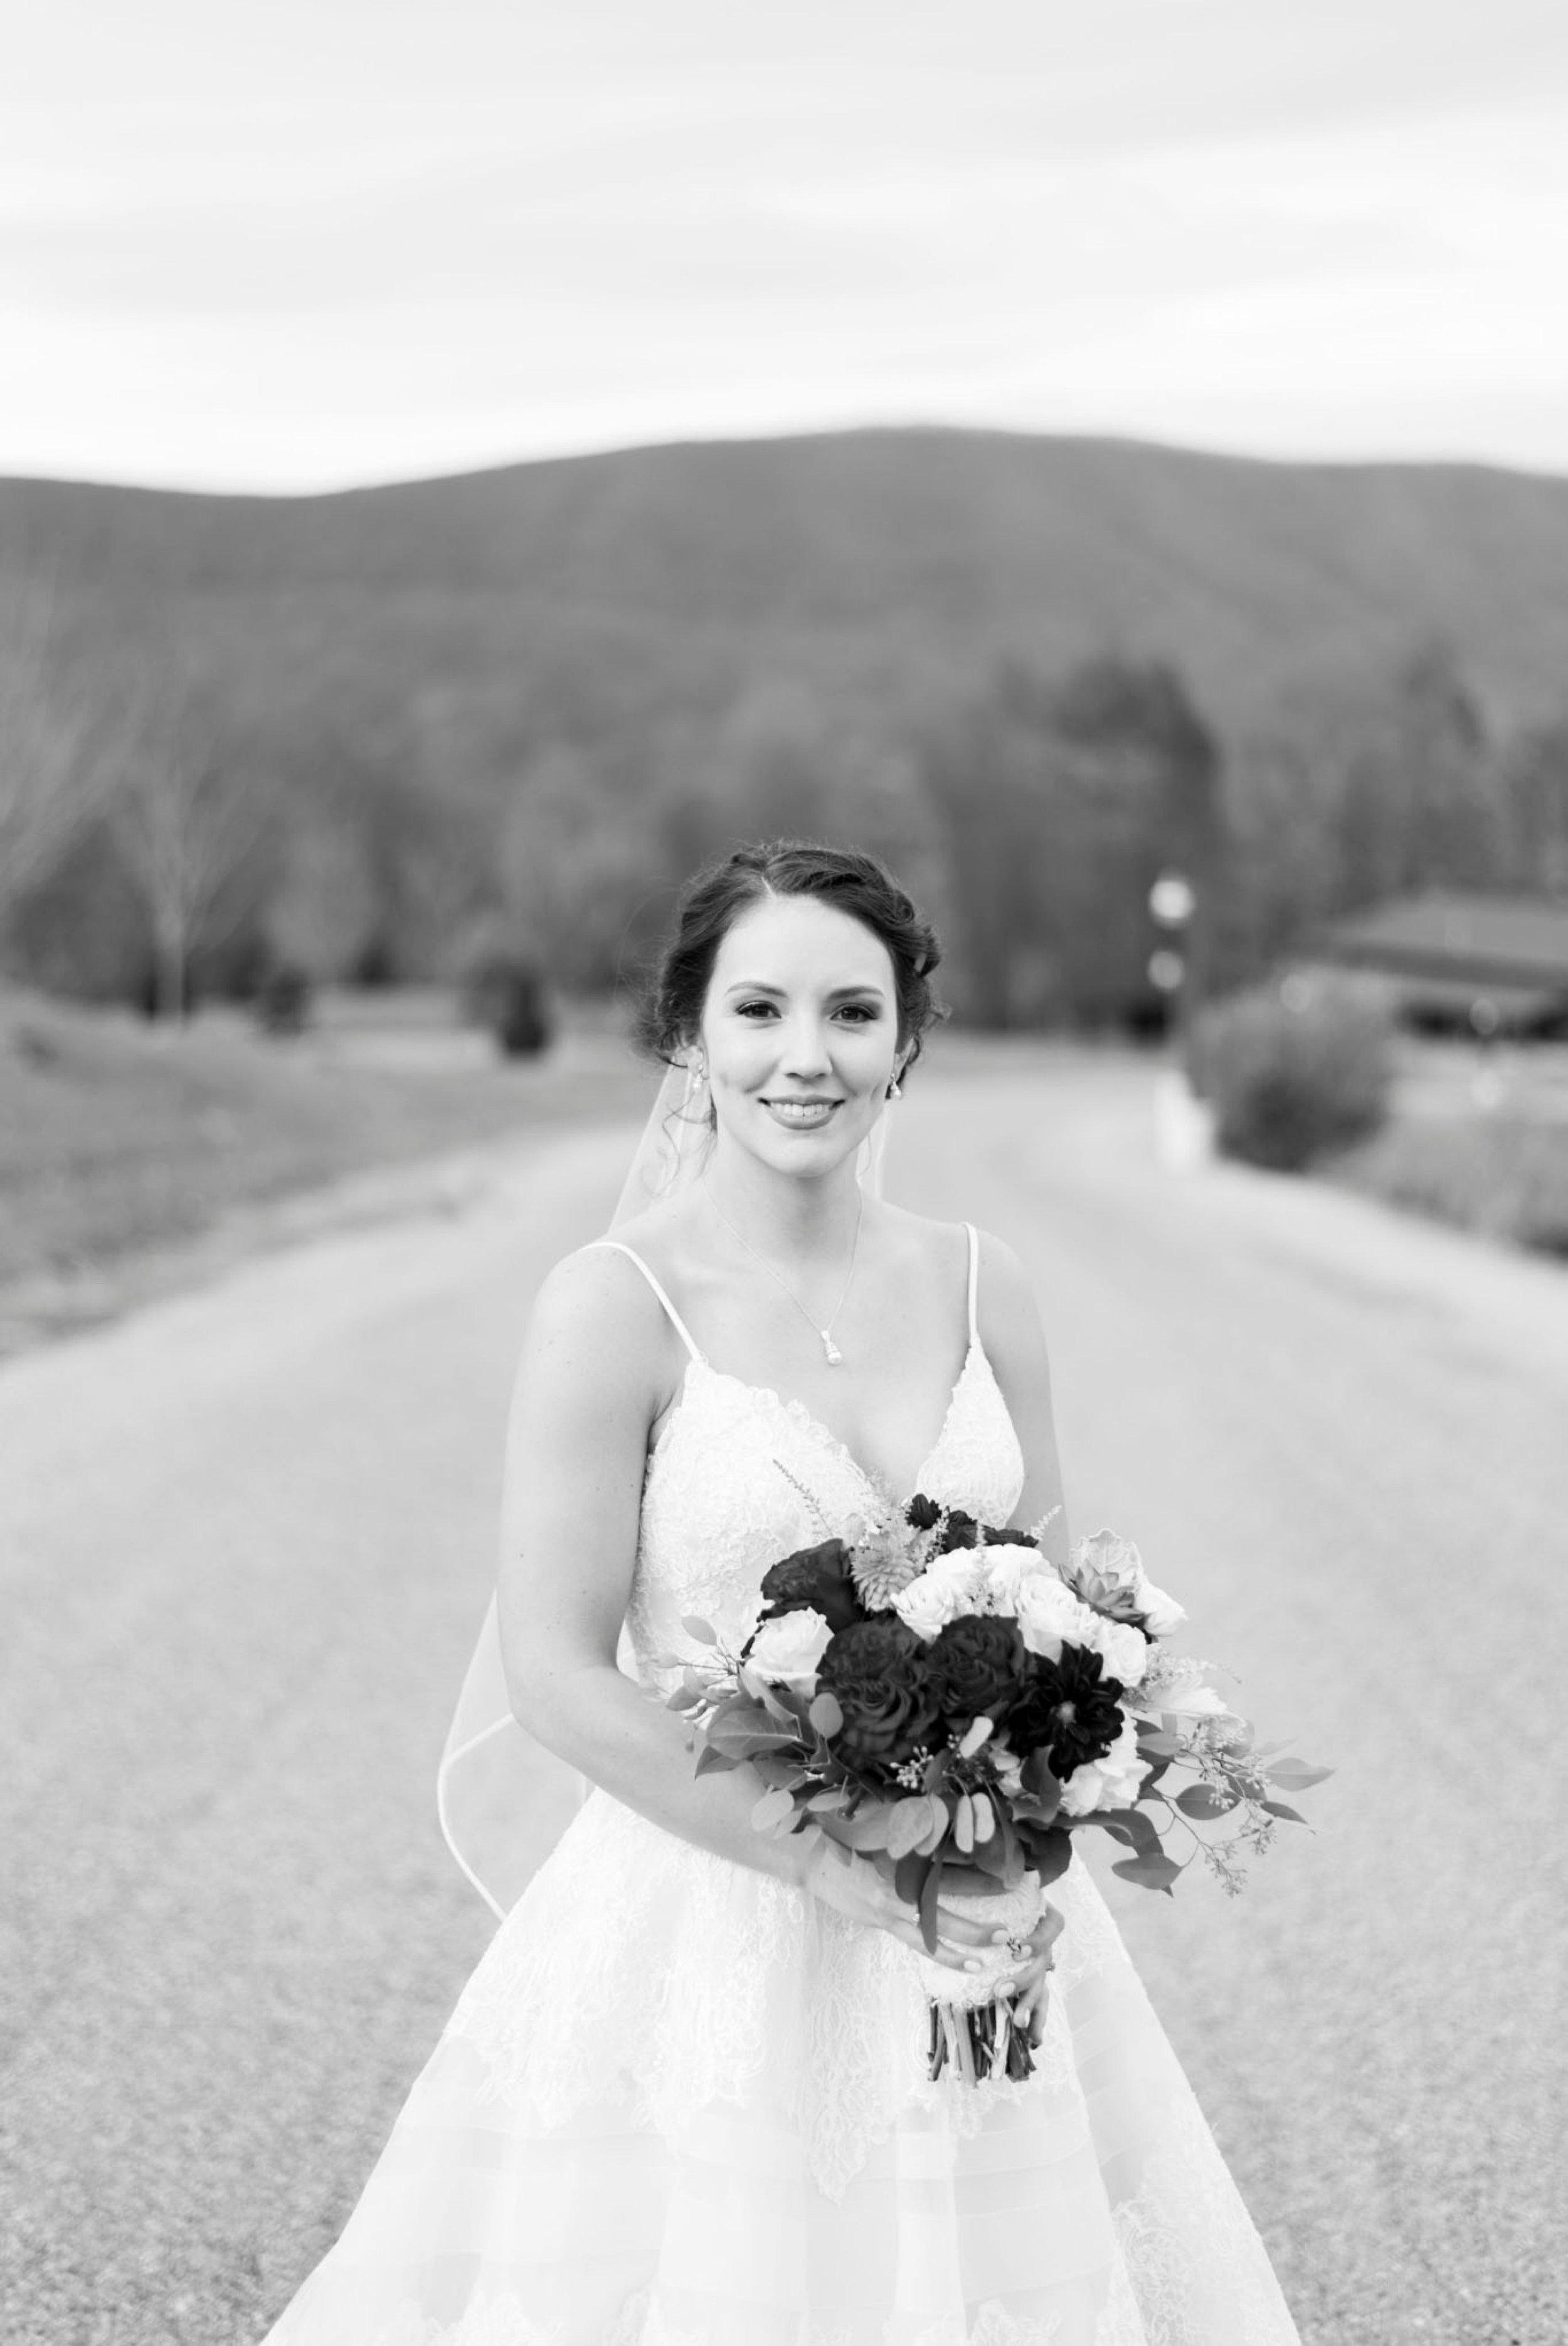 IrvineEstate_LexingtonVA_Wedding_FallWedding_VirginiaWeddingPhotographer 44.jpg